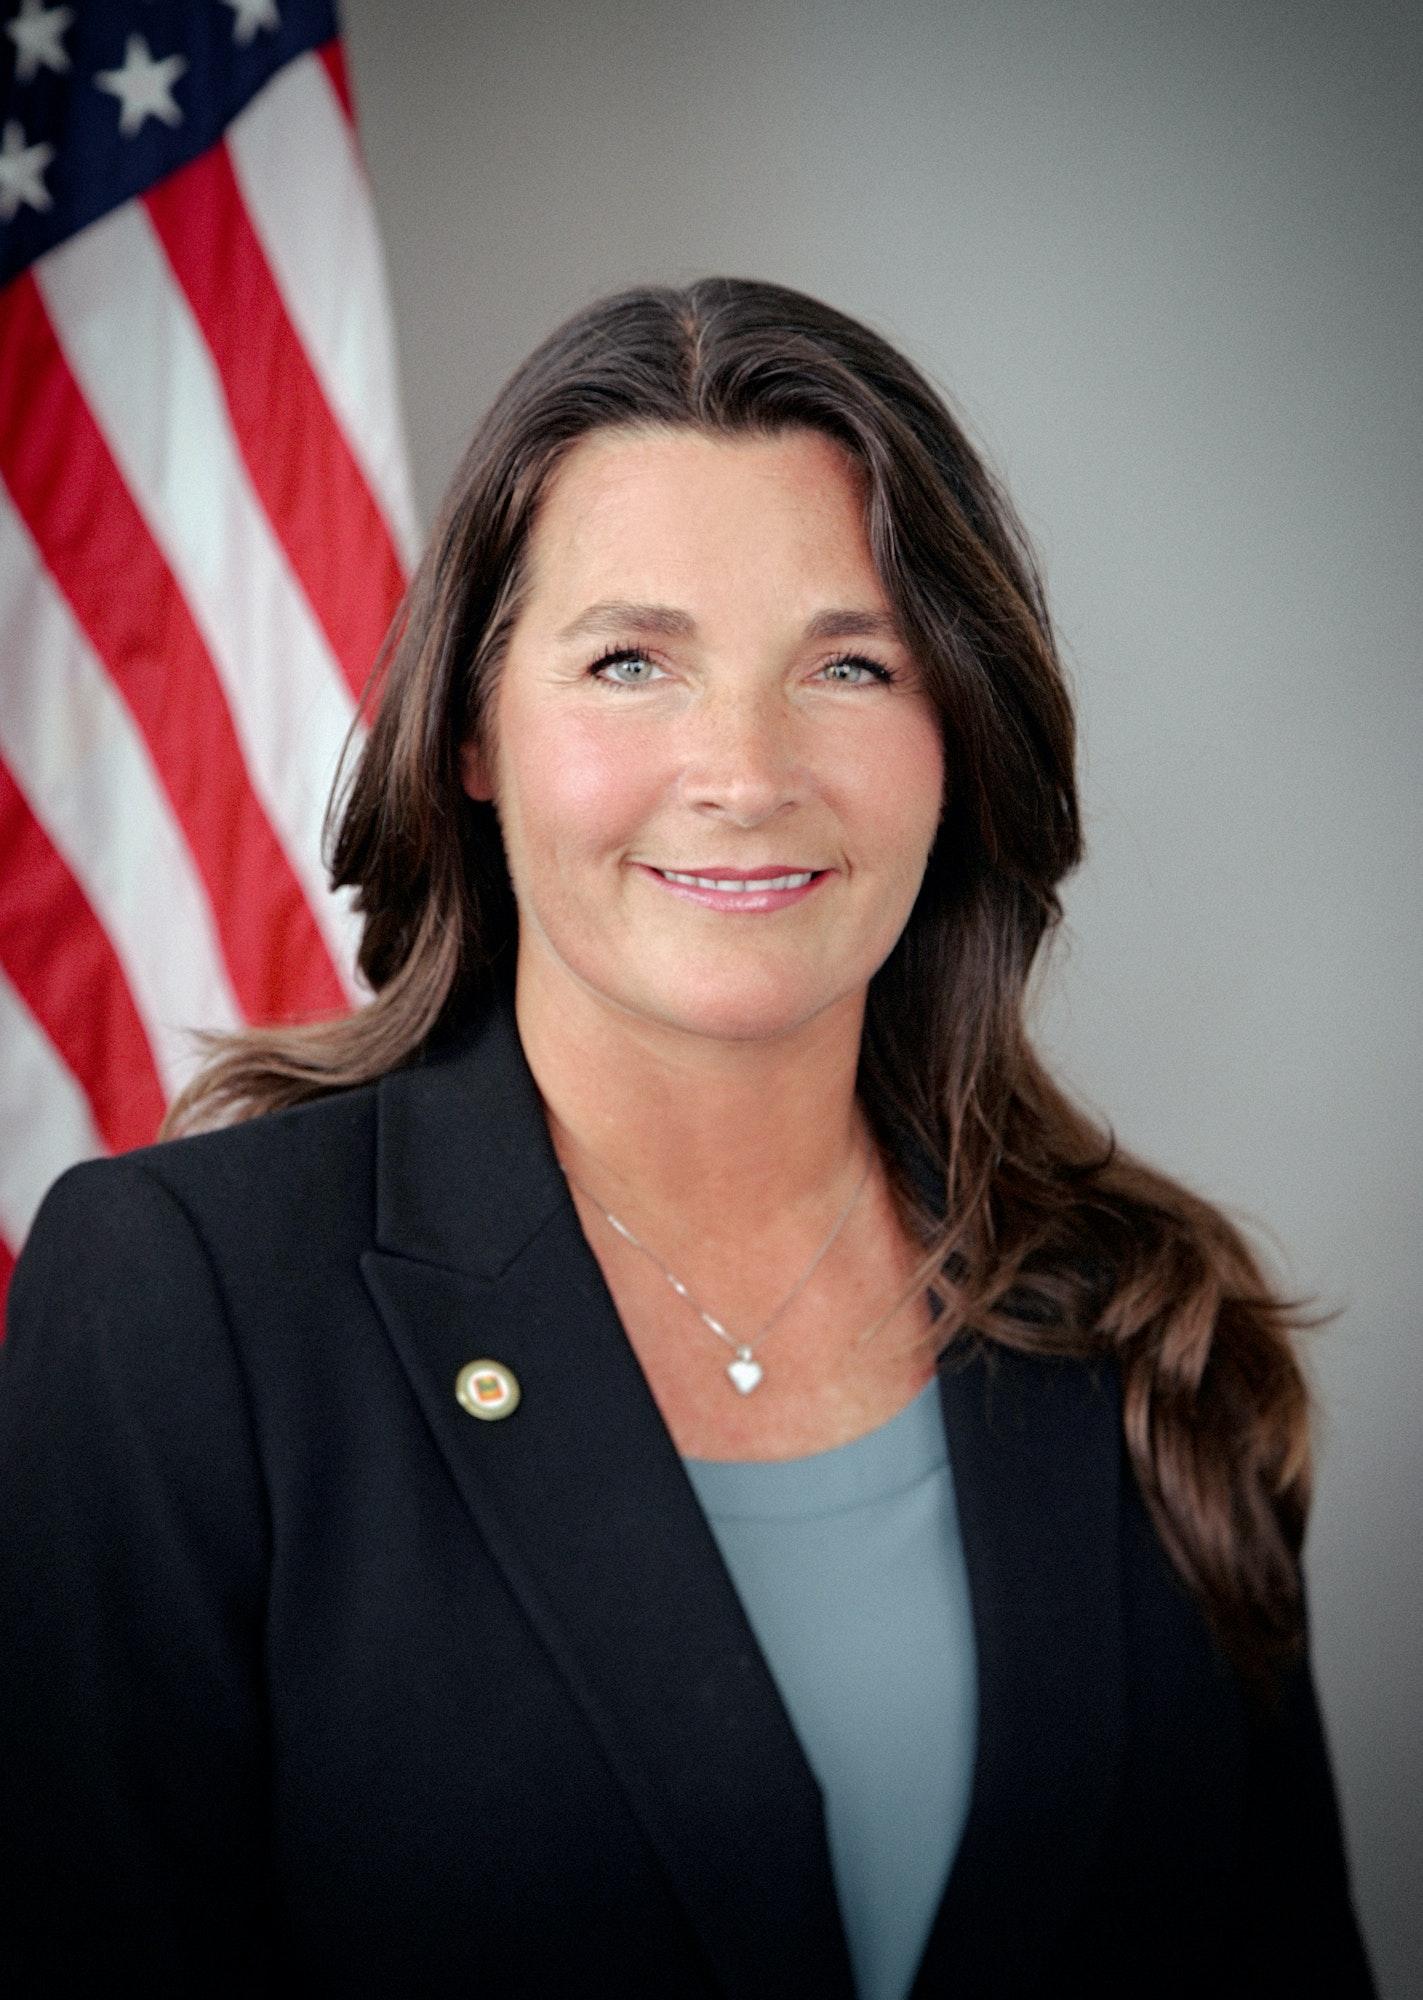 Board member Tanya Siskind